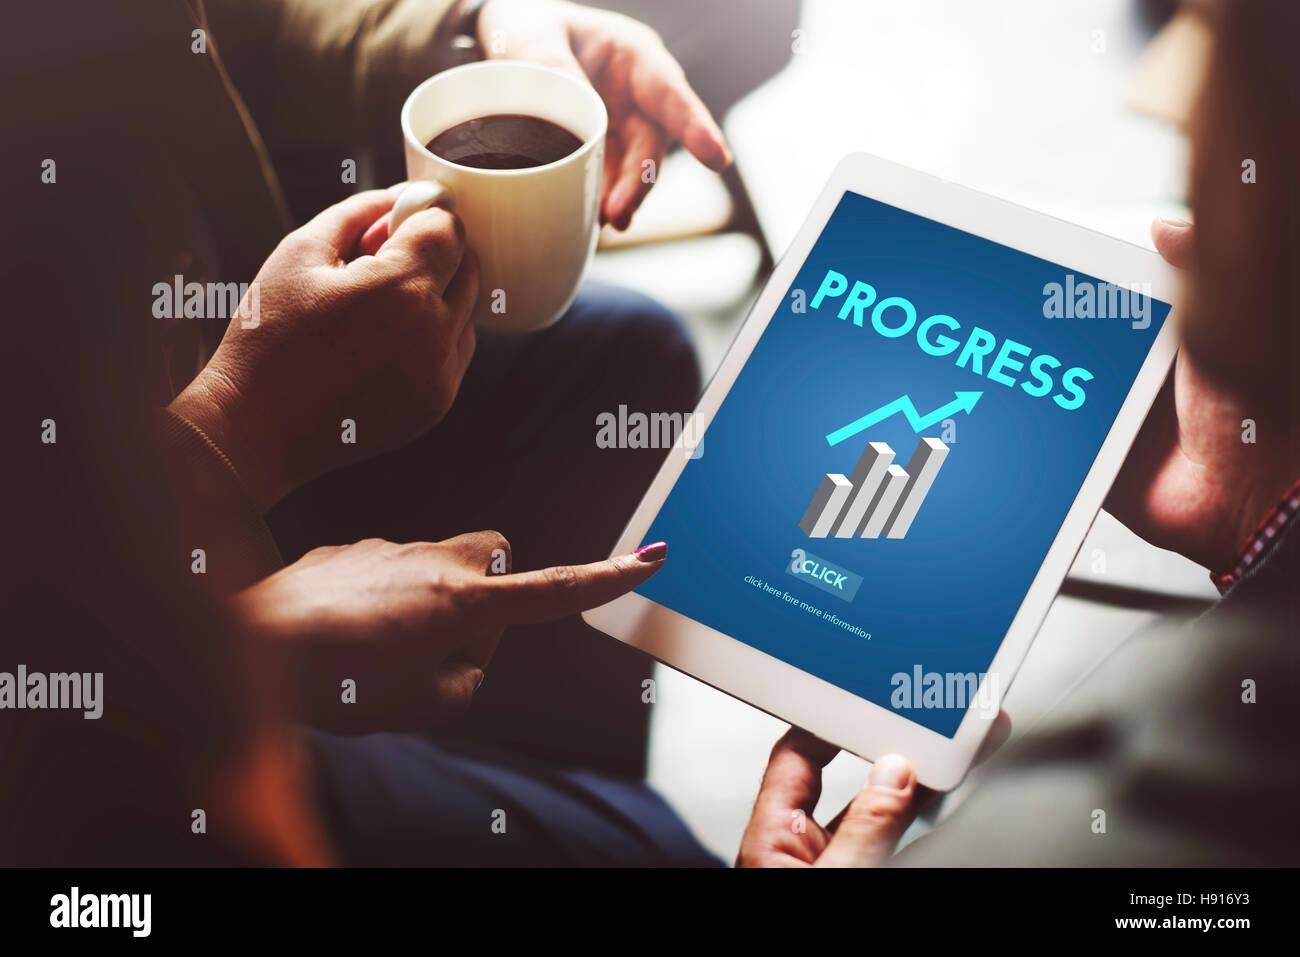 Progress Advance Growth Improvement Better Concept - Stock Image